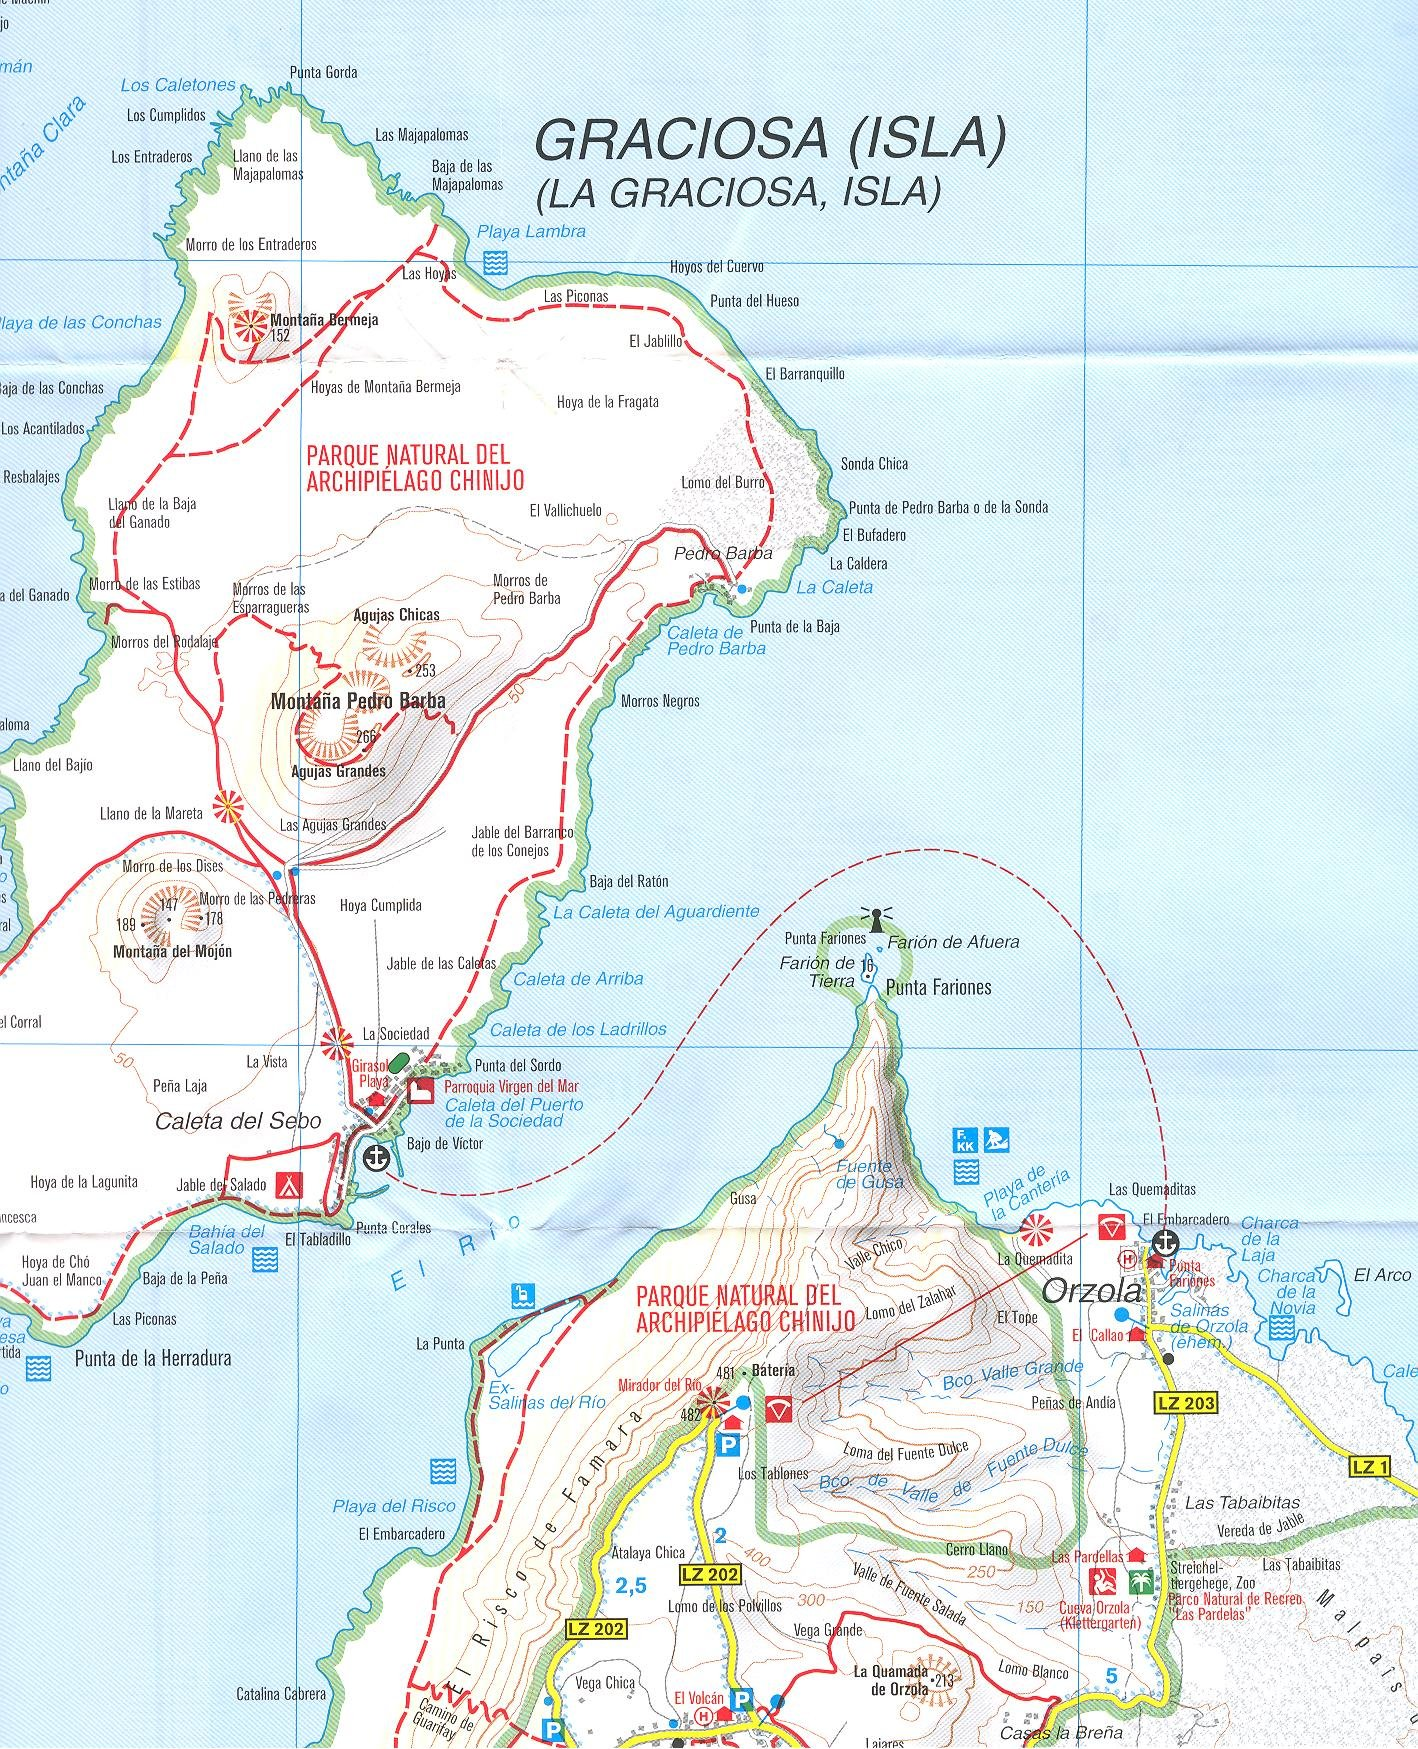 Cartina Lanzarote.Lanzarote 1 50 000 Contoured Hiking Map Gps Precise Kompass 2012 Edition Kompass 9788074321863 Amazon Com Books